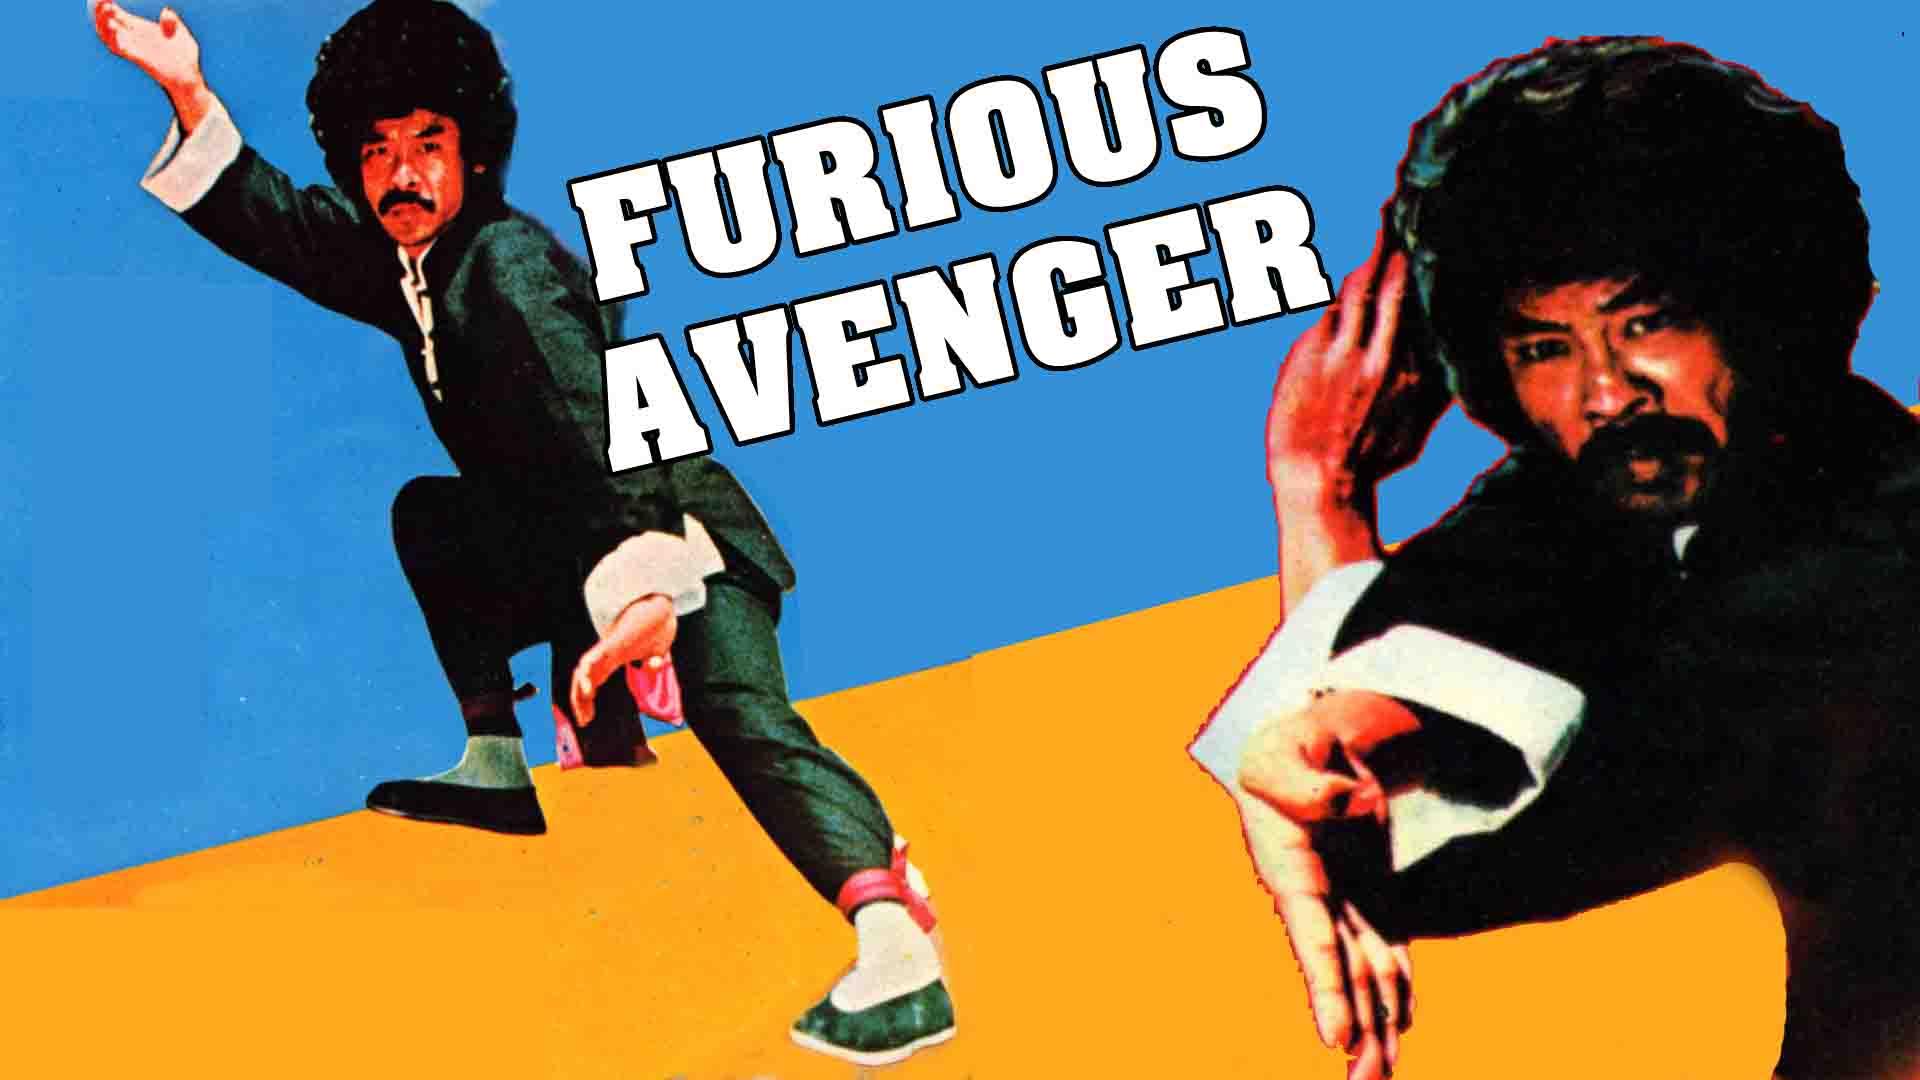 Furious Avenger